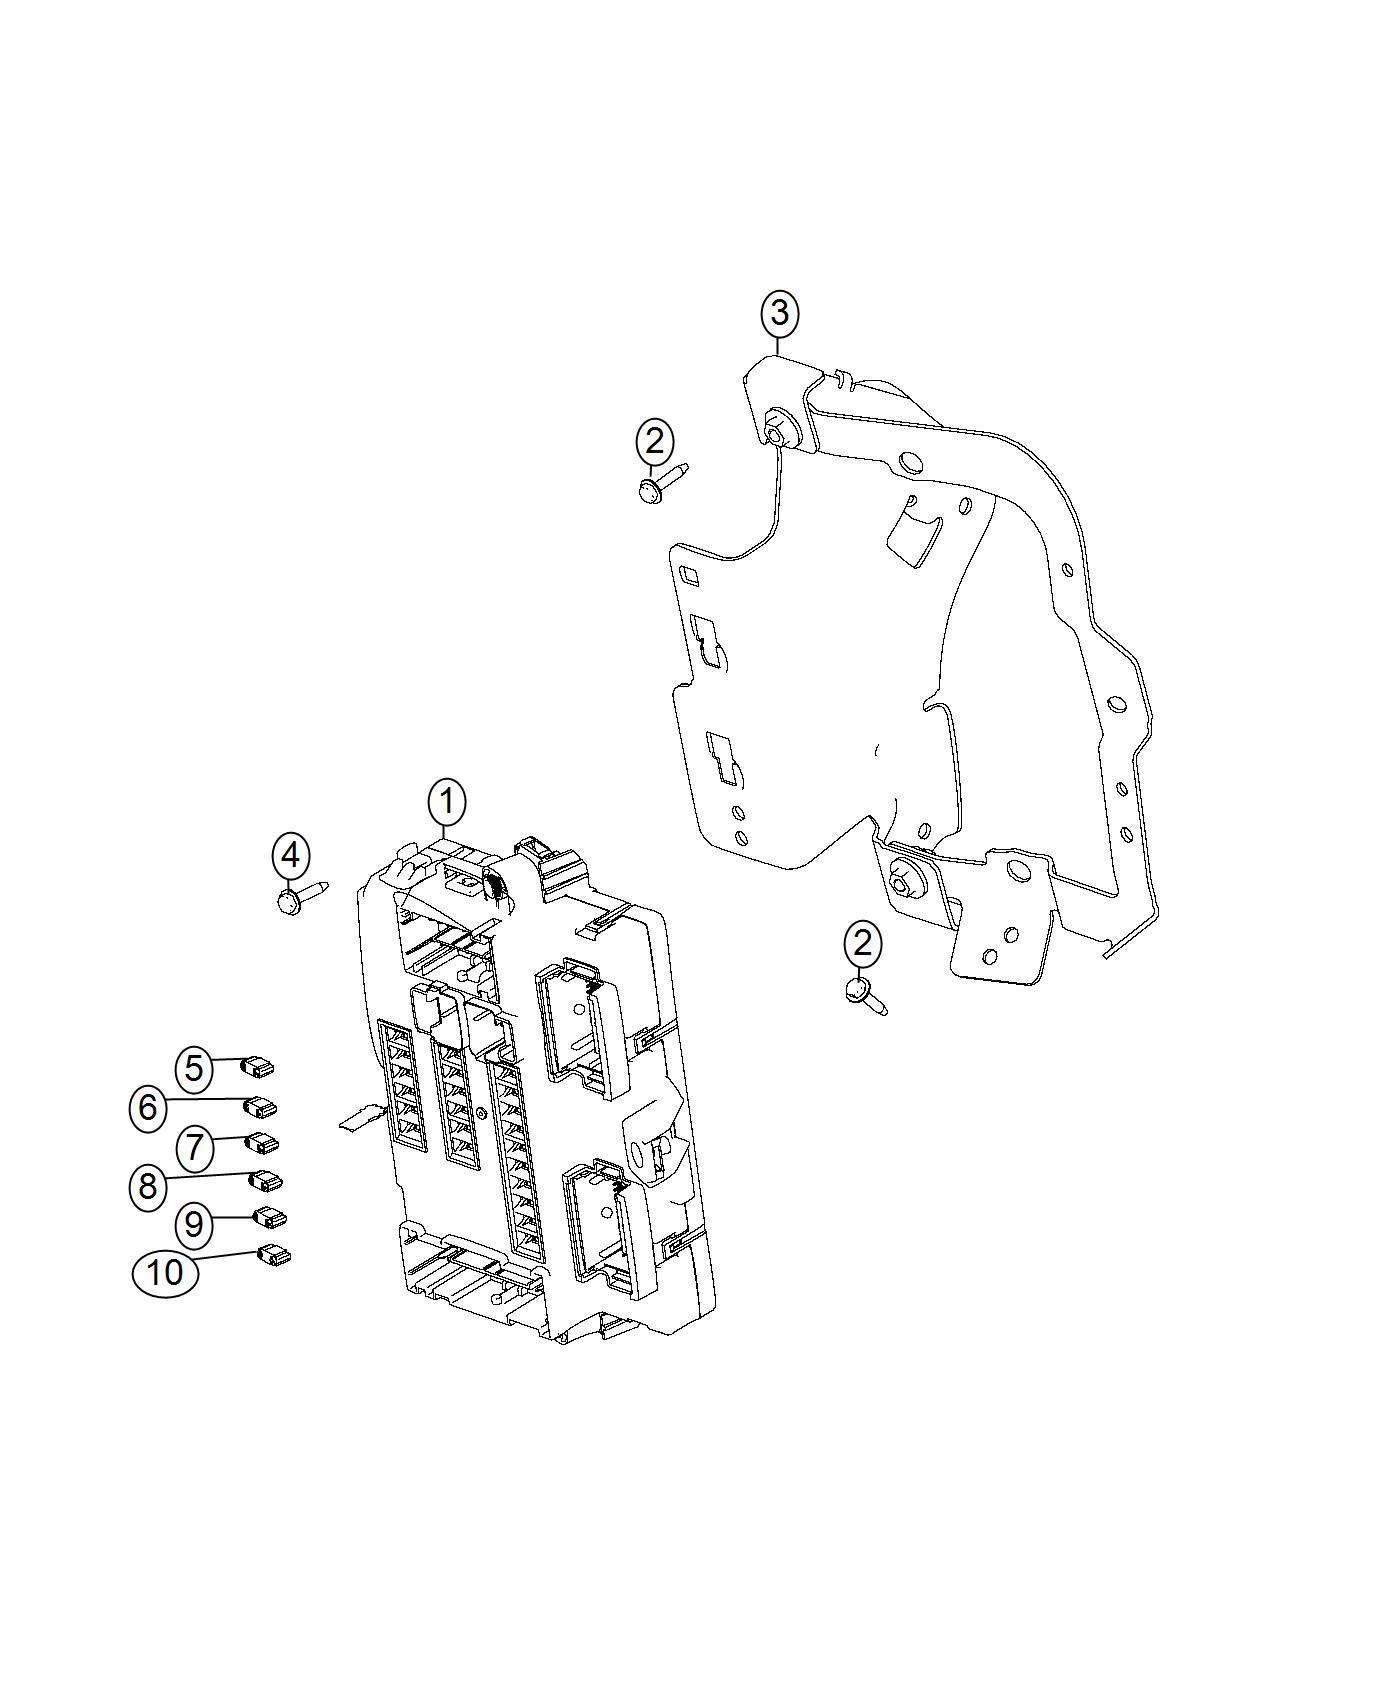 31 Dodge Dart Fuse Box Diagram